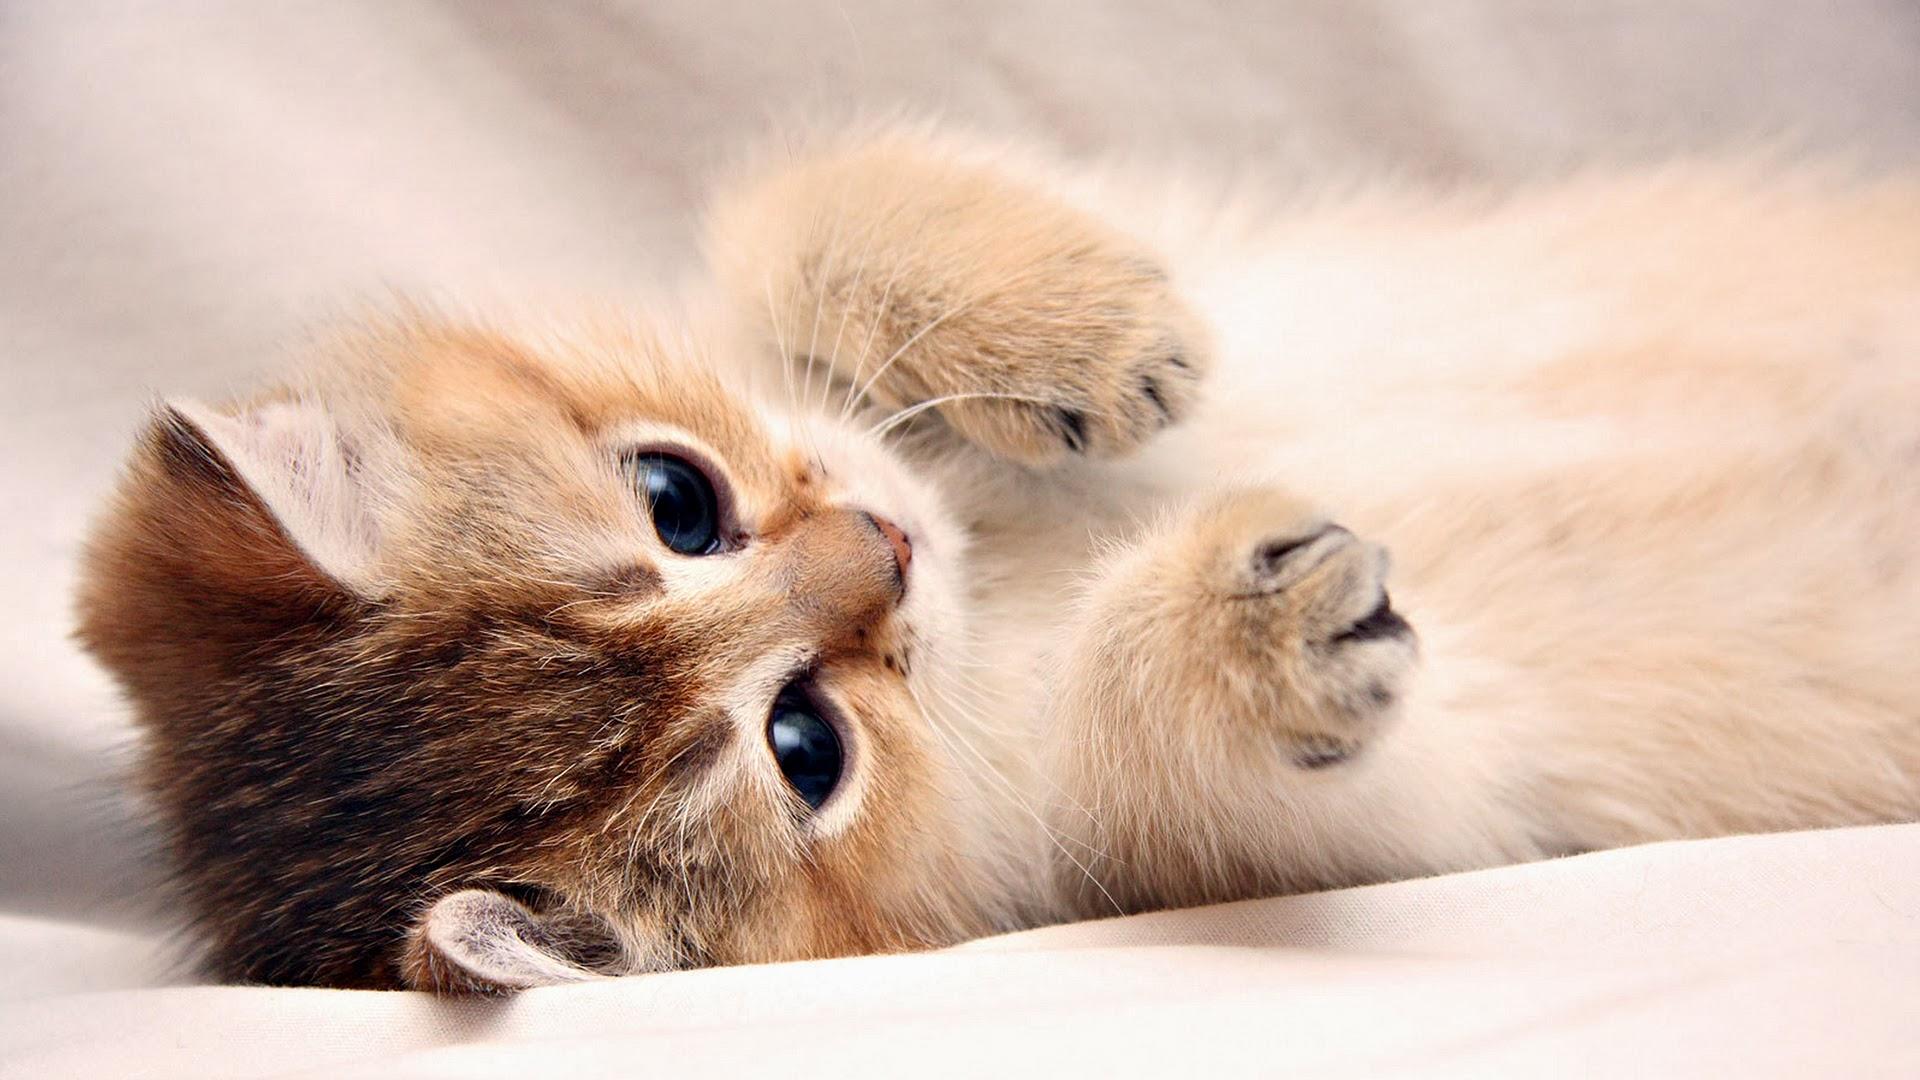 Cute Cat Wallpaper Cute Kitten Cat Hd Wallpaper 1920×1080 ...